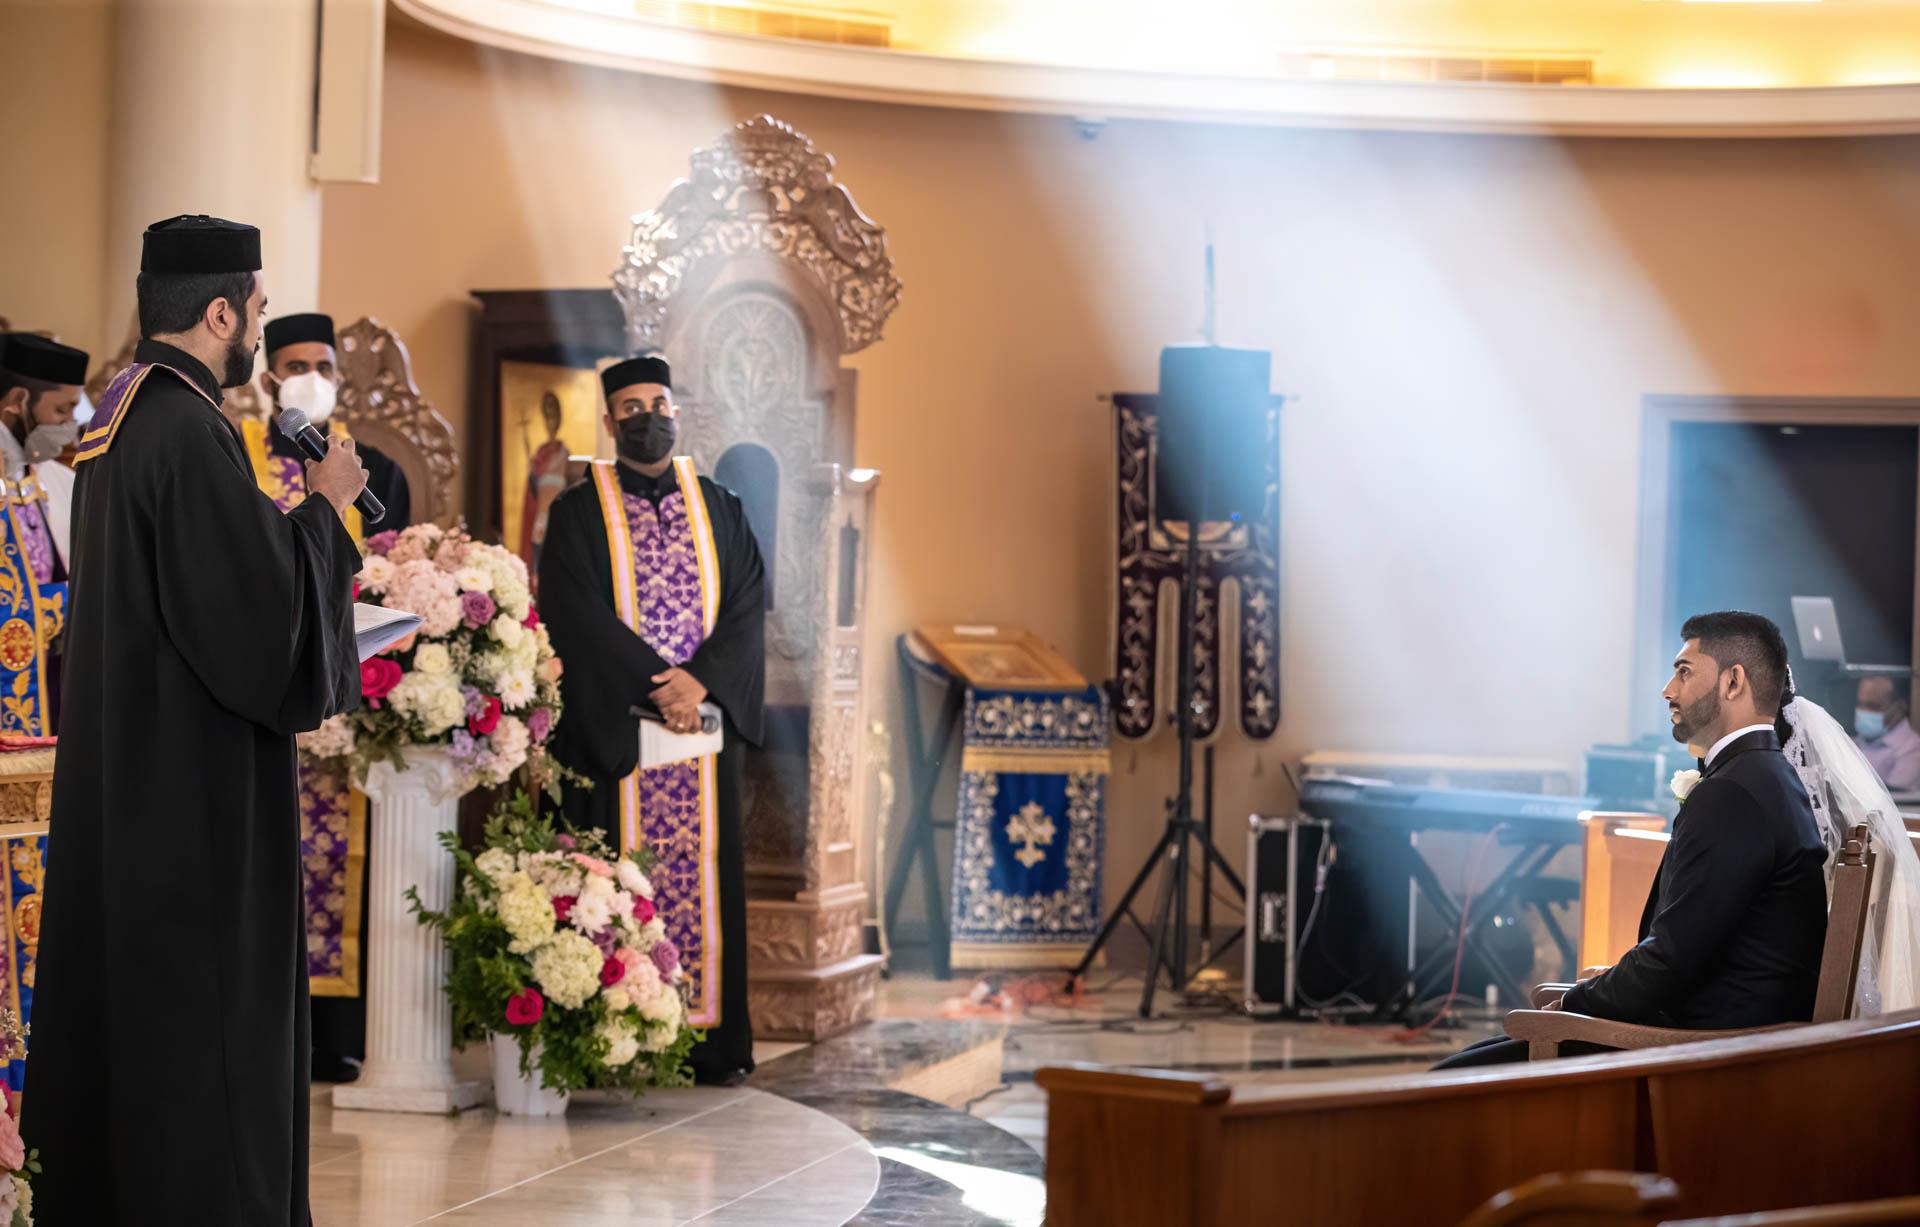 WESTMOUNT COUNTRY CLUB INDIAN WEDDING 15